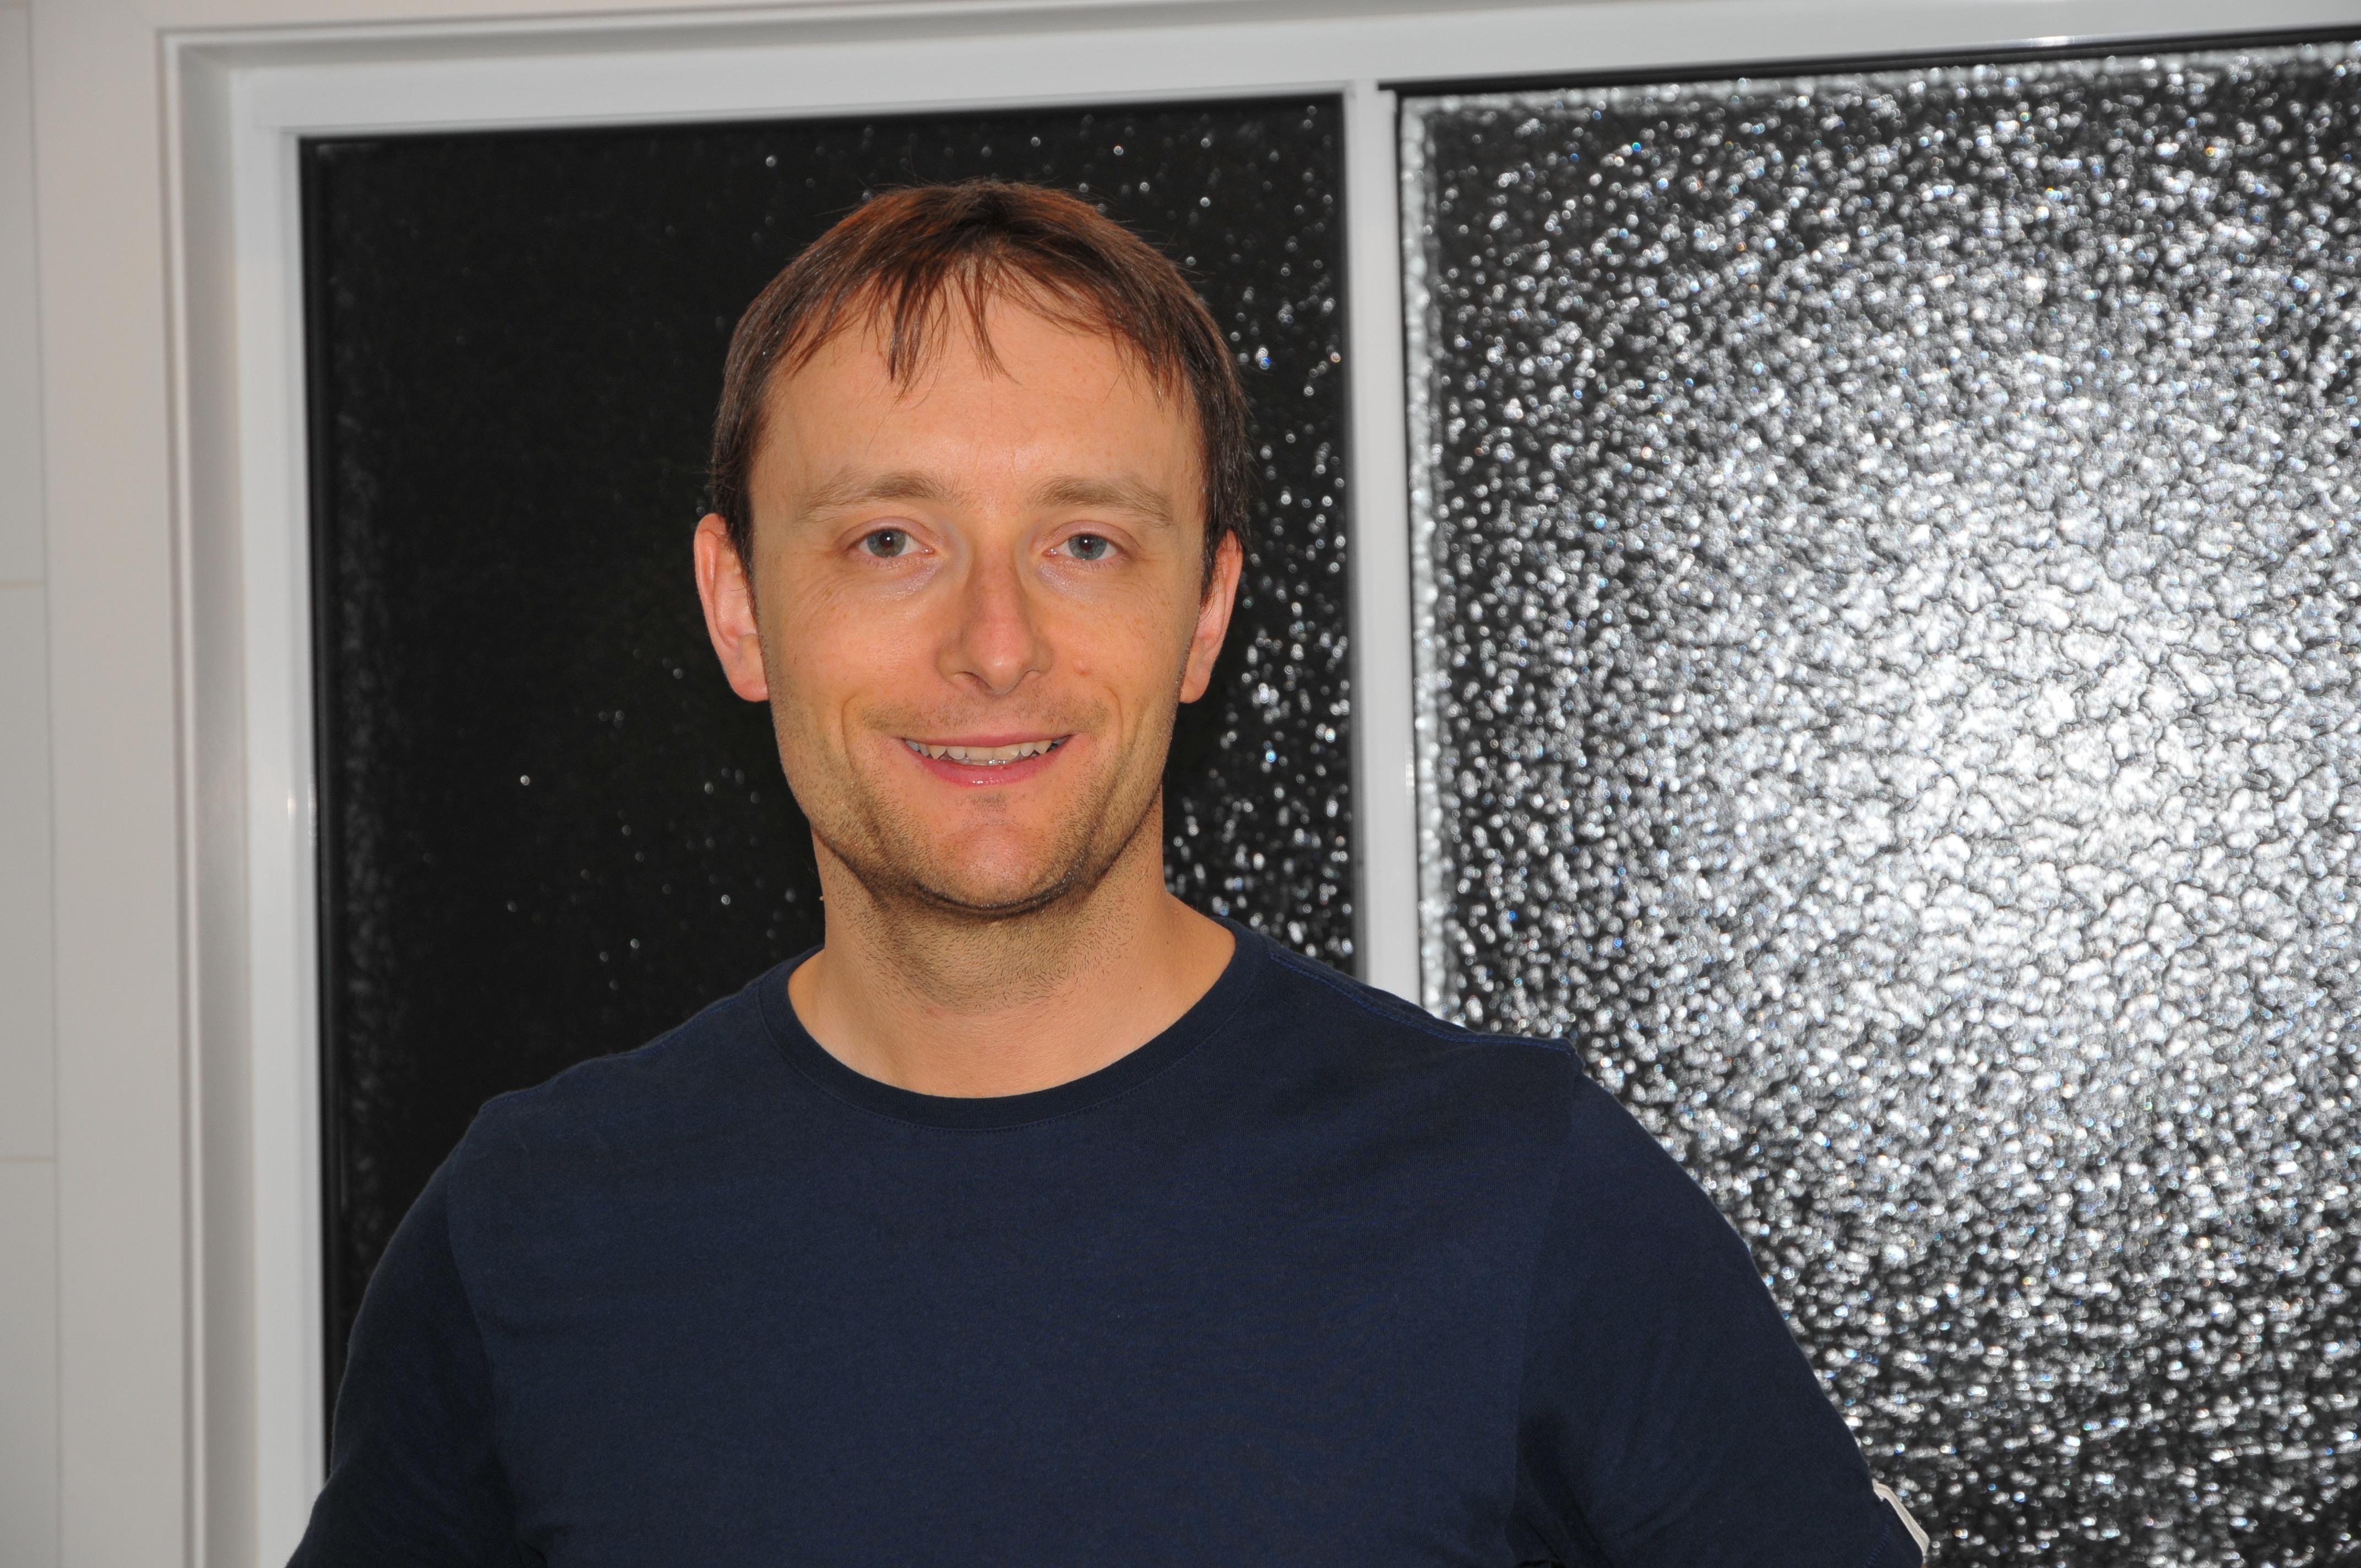 Edward Kowalski